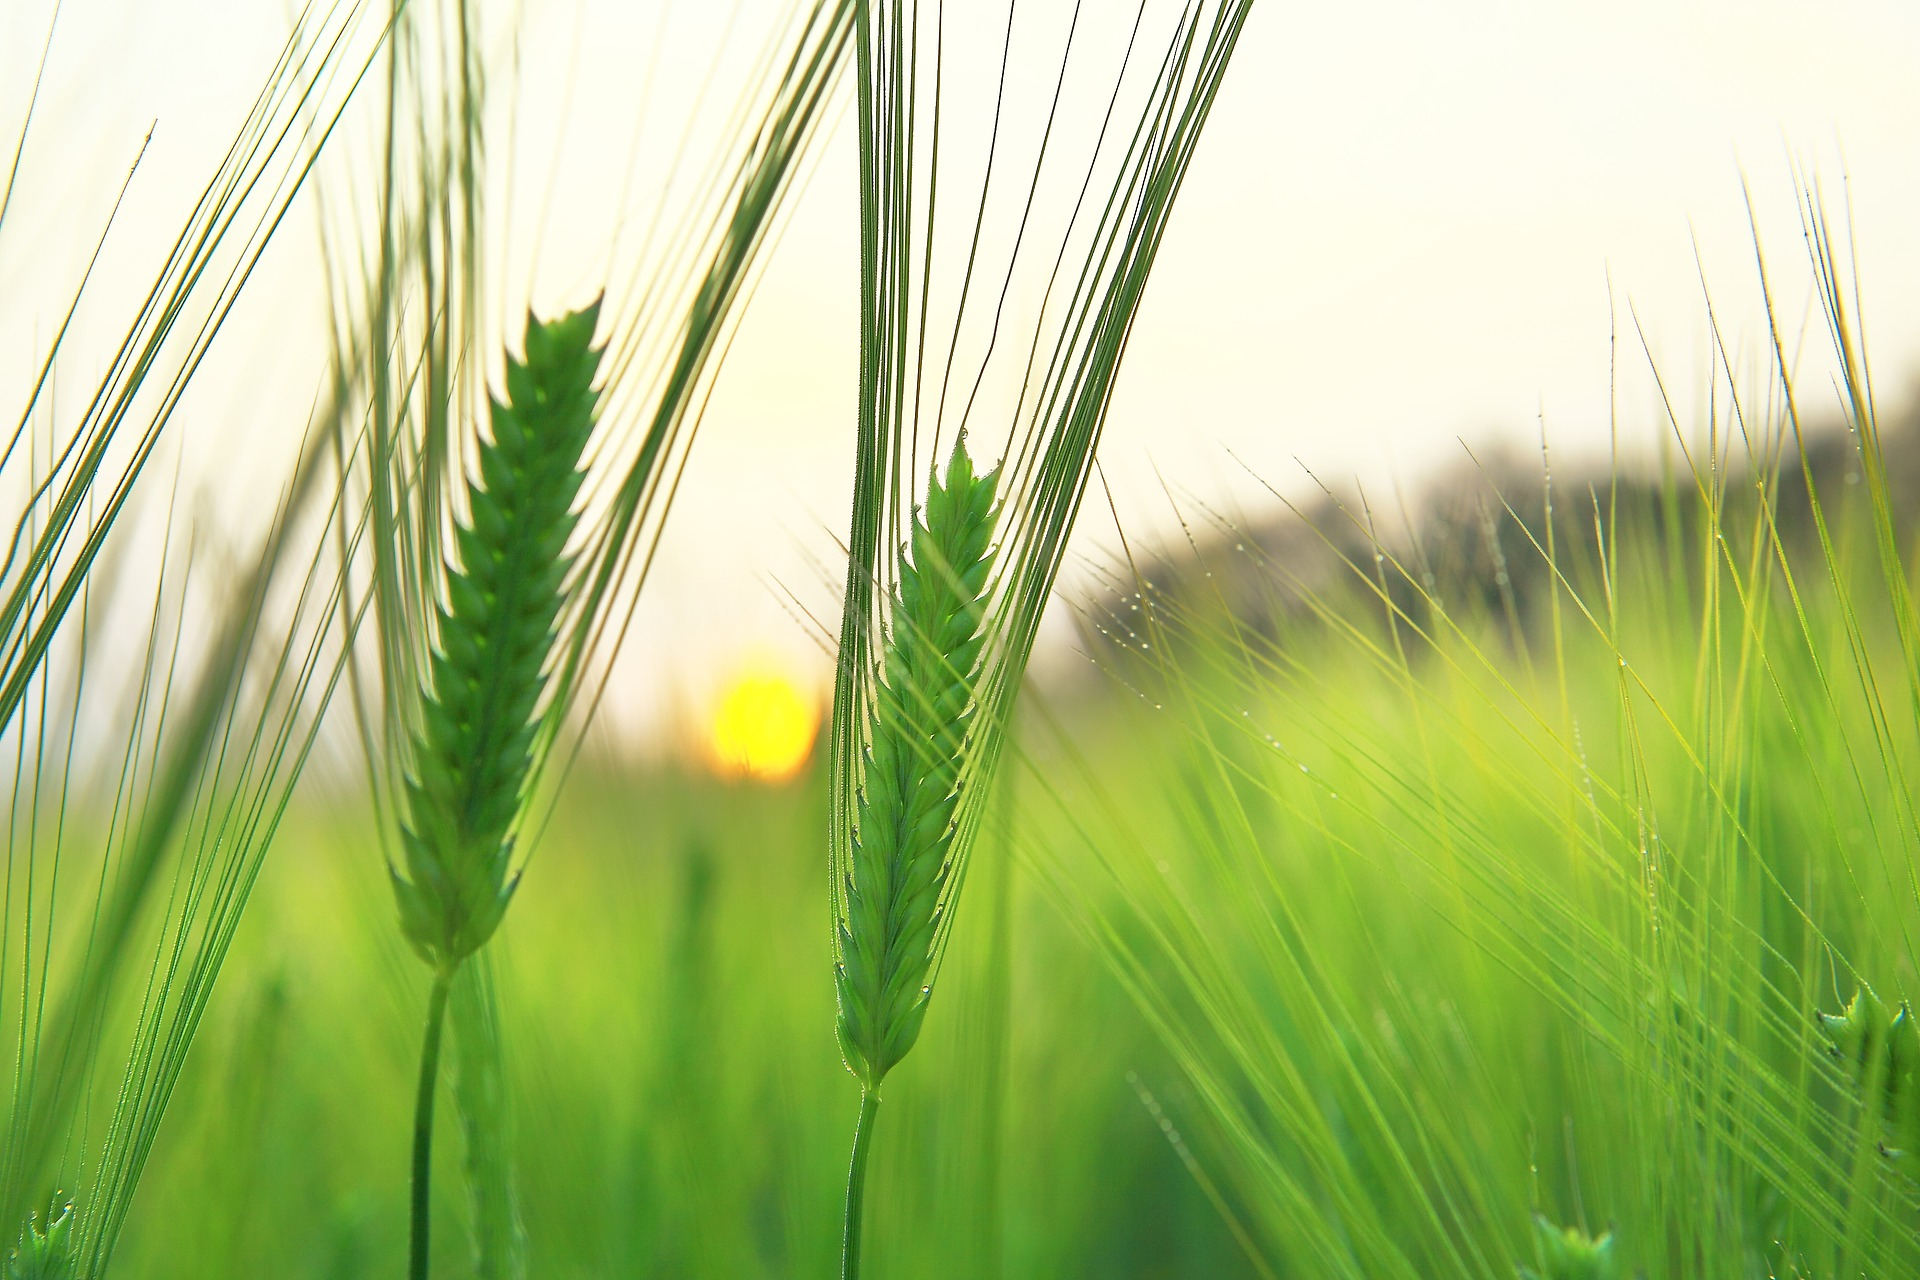 barley-field-1684049_1920.jpg